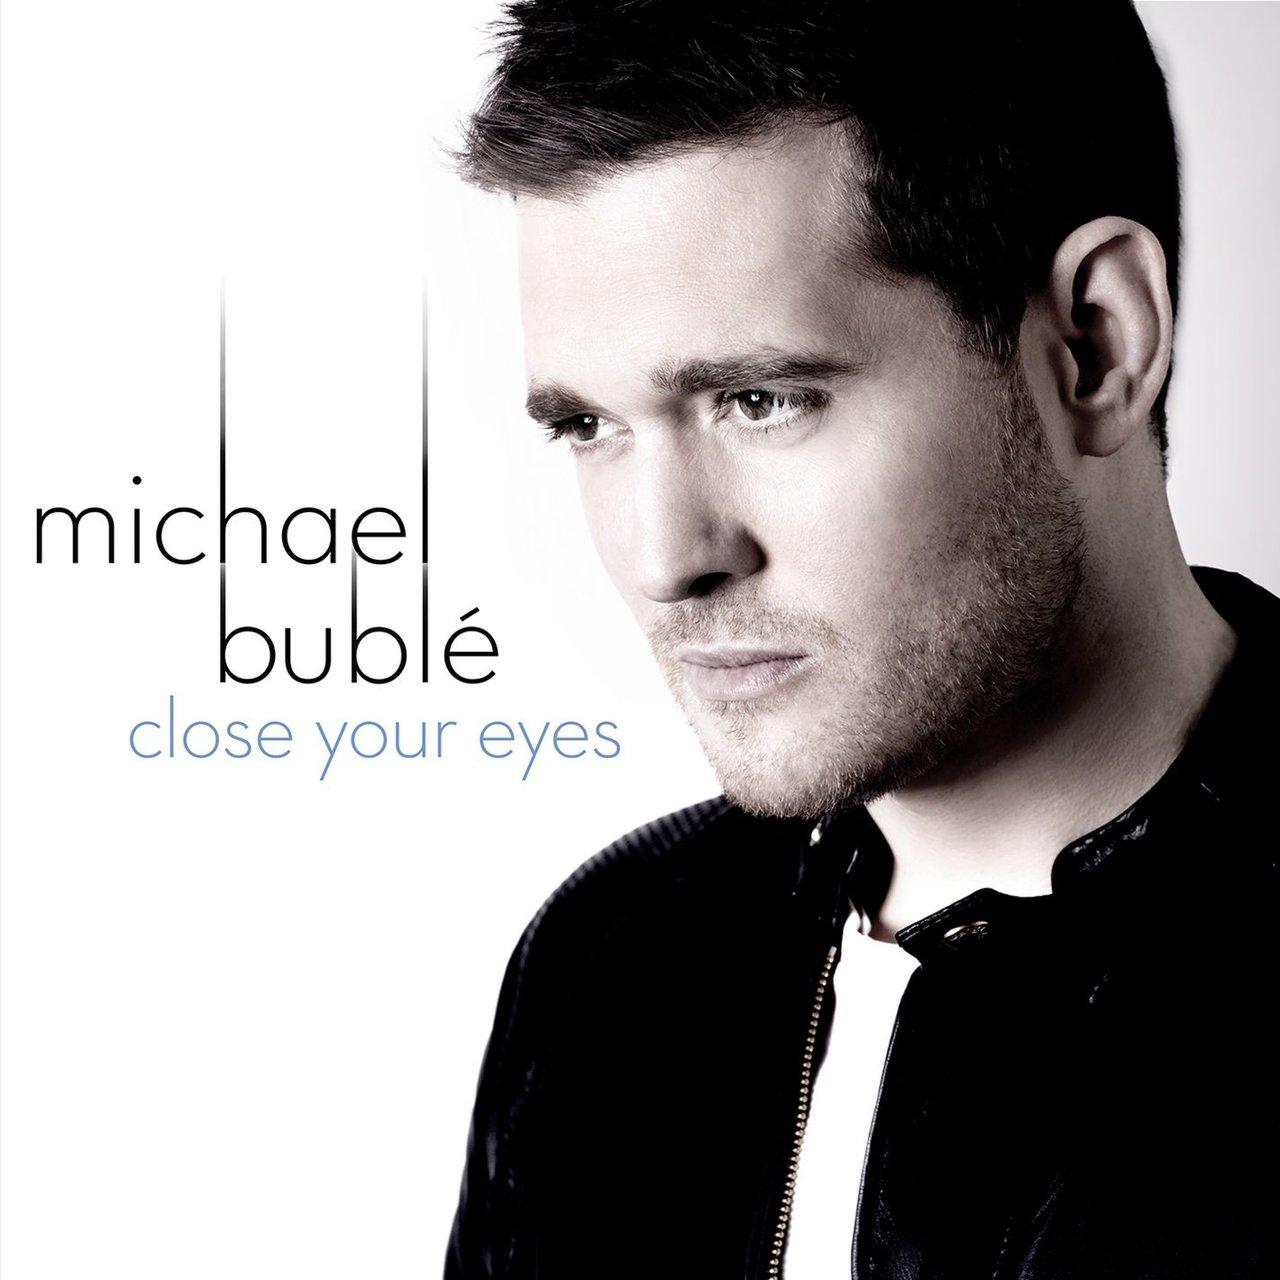 TIDAL: Listen to Michael Bublé on TIDAL